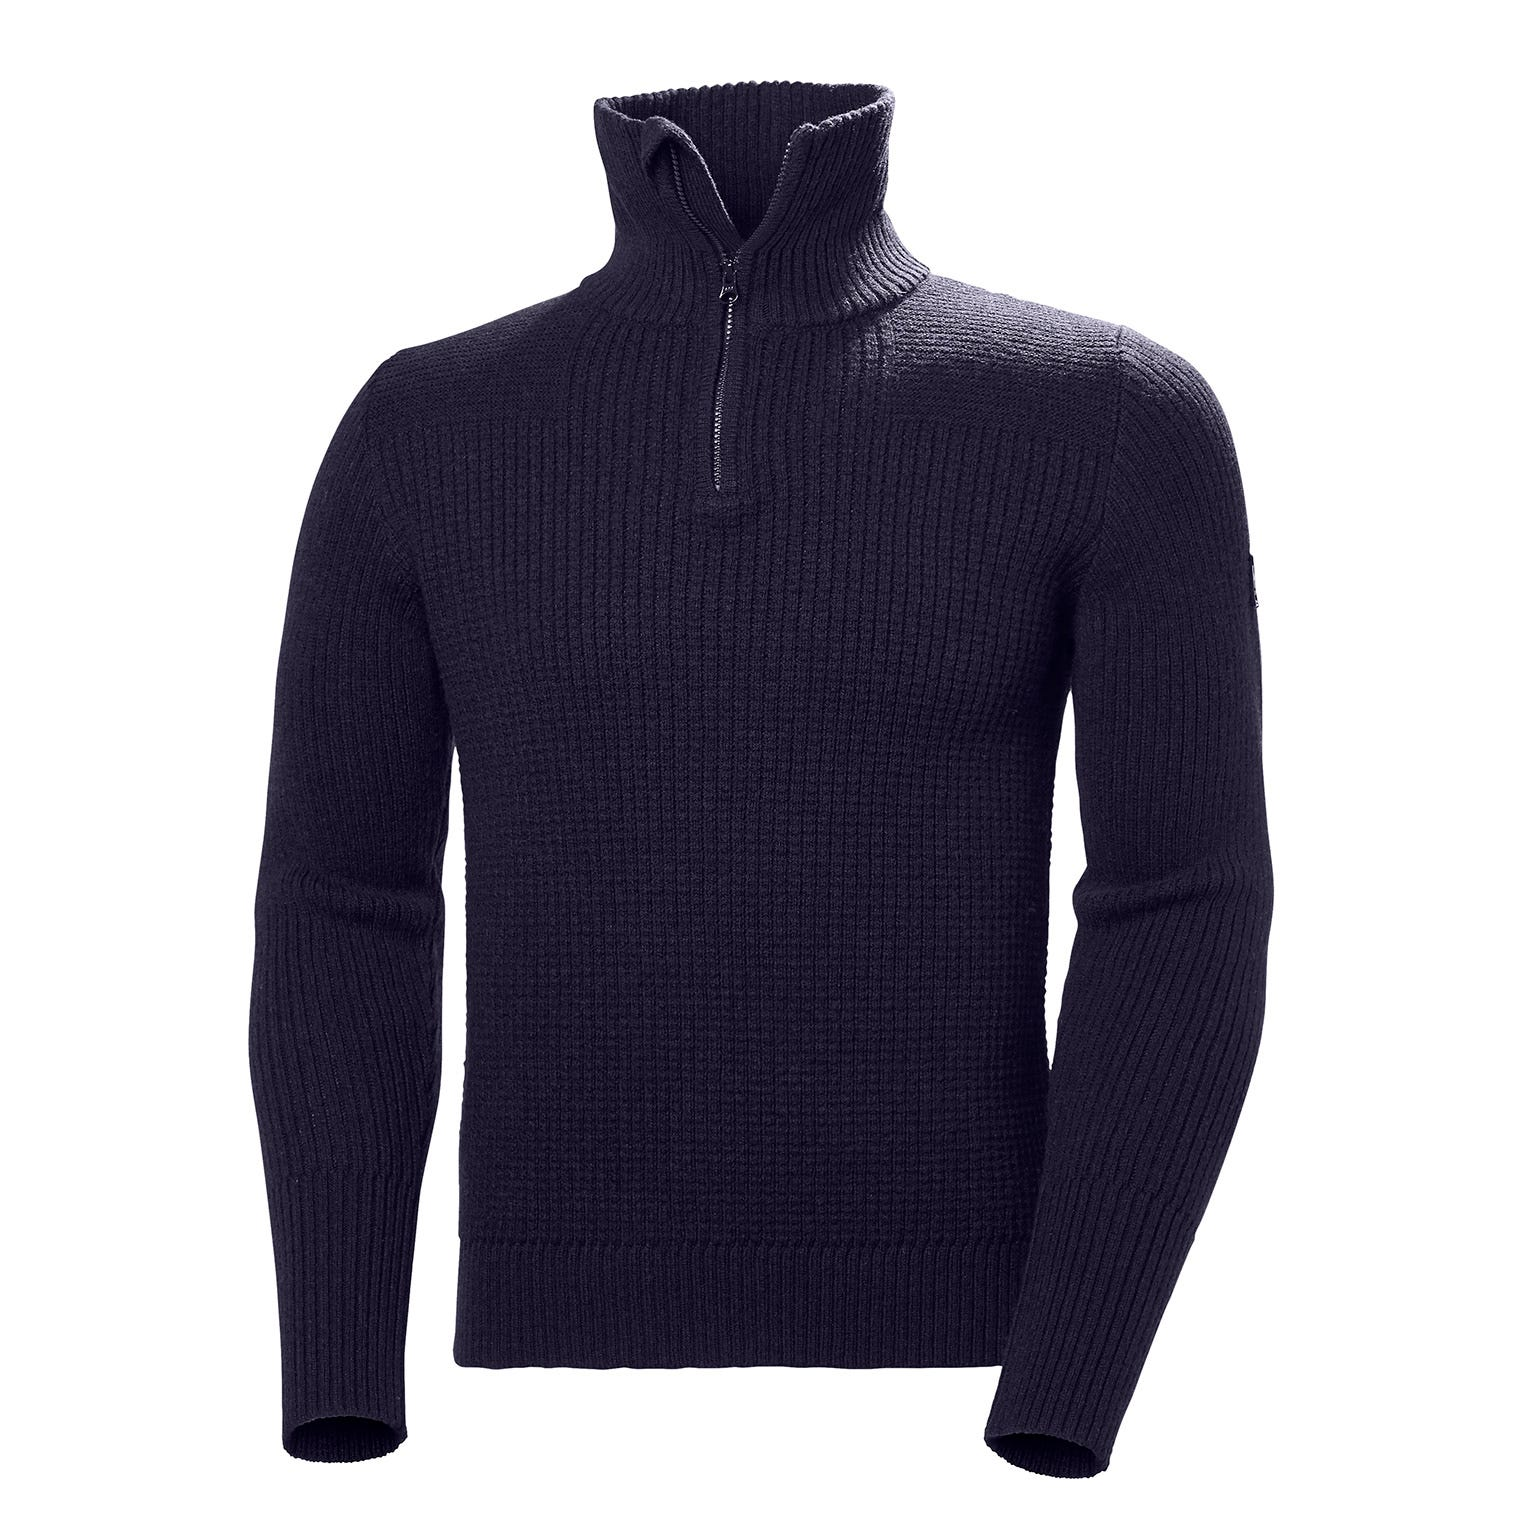 Marka Wool Sweater | Traditional Knitted Ski Gb Helly Hansen Mens Fleece Navy XXL